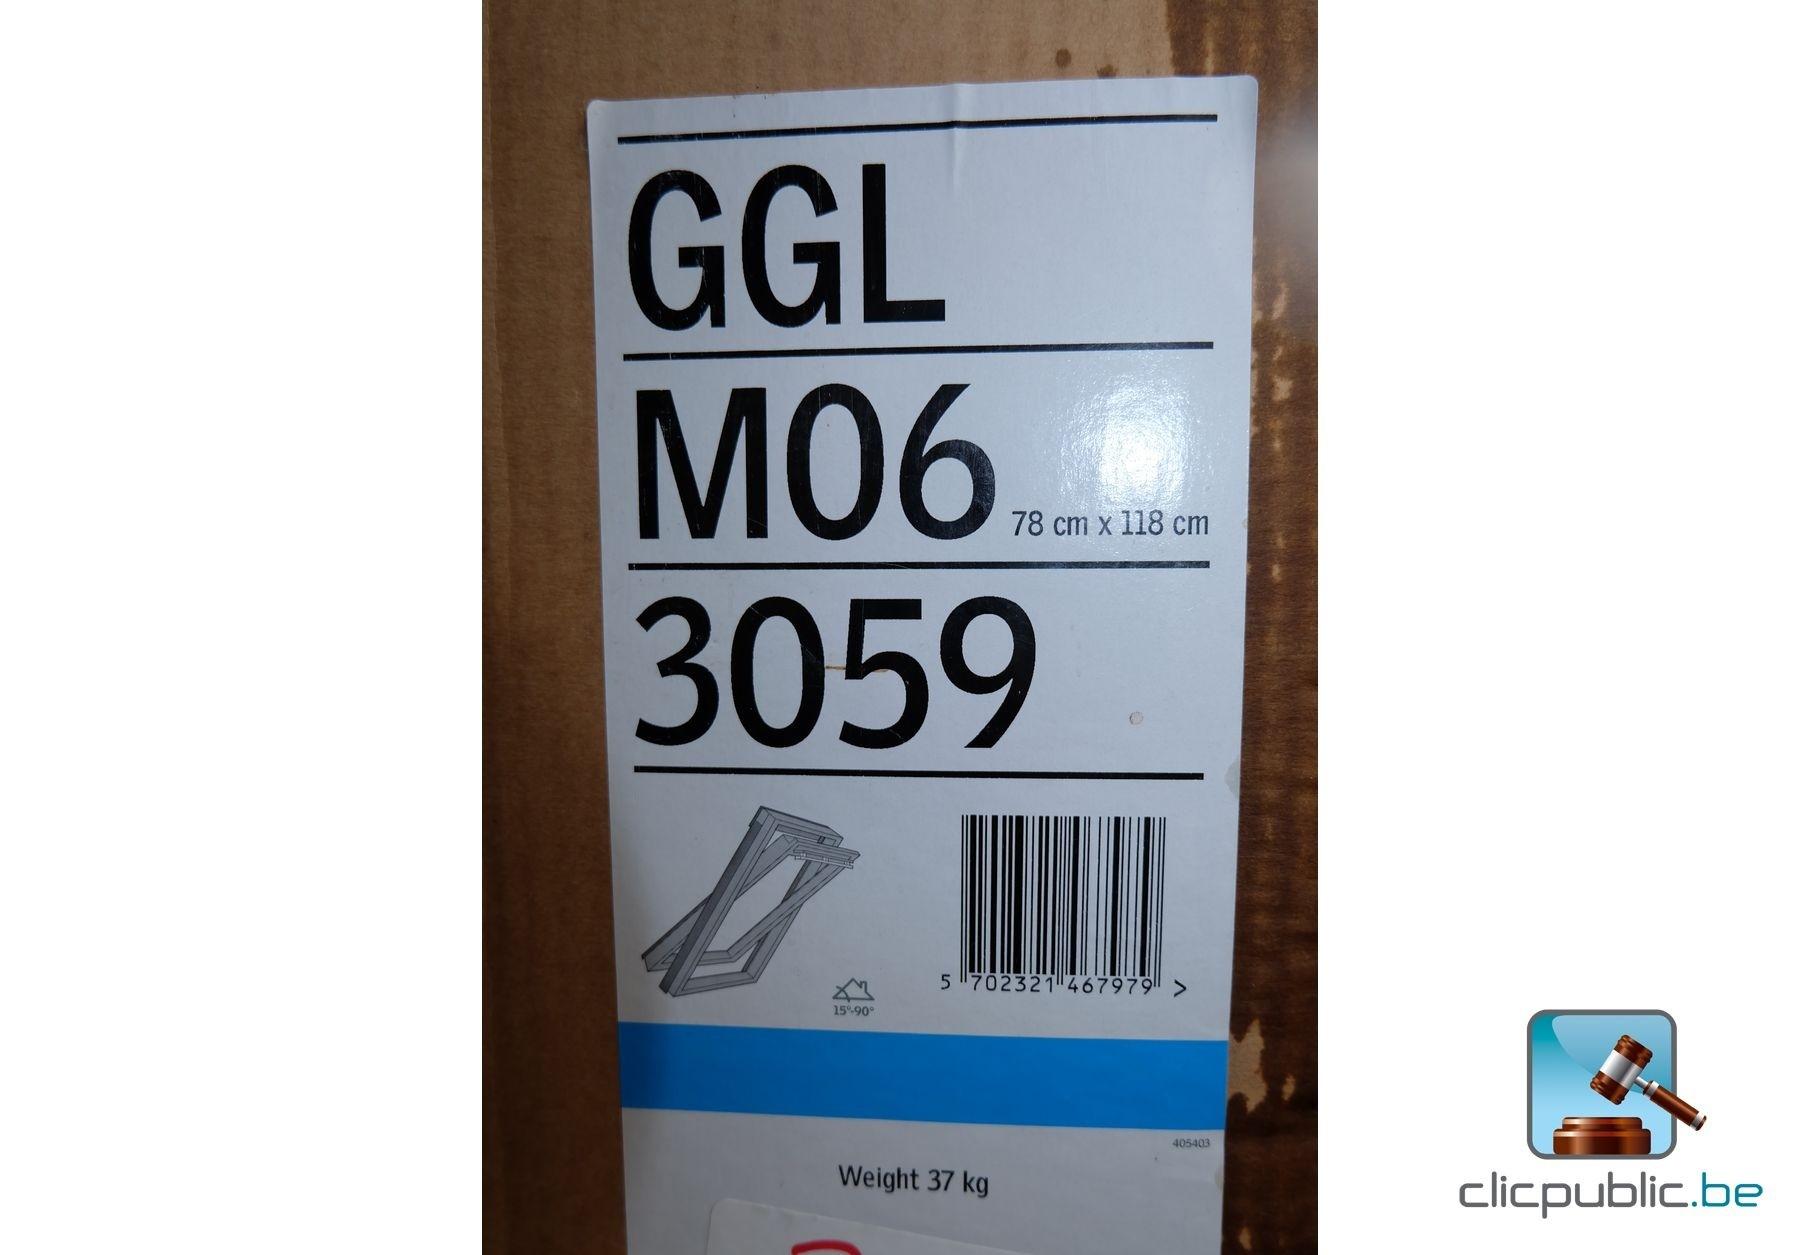 Velux ggl m06 ref 36 vendre sur for Velux ggl 9 prix